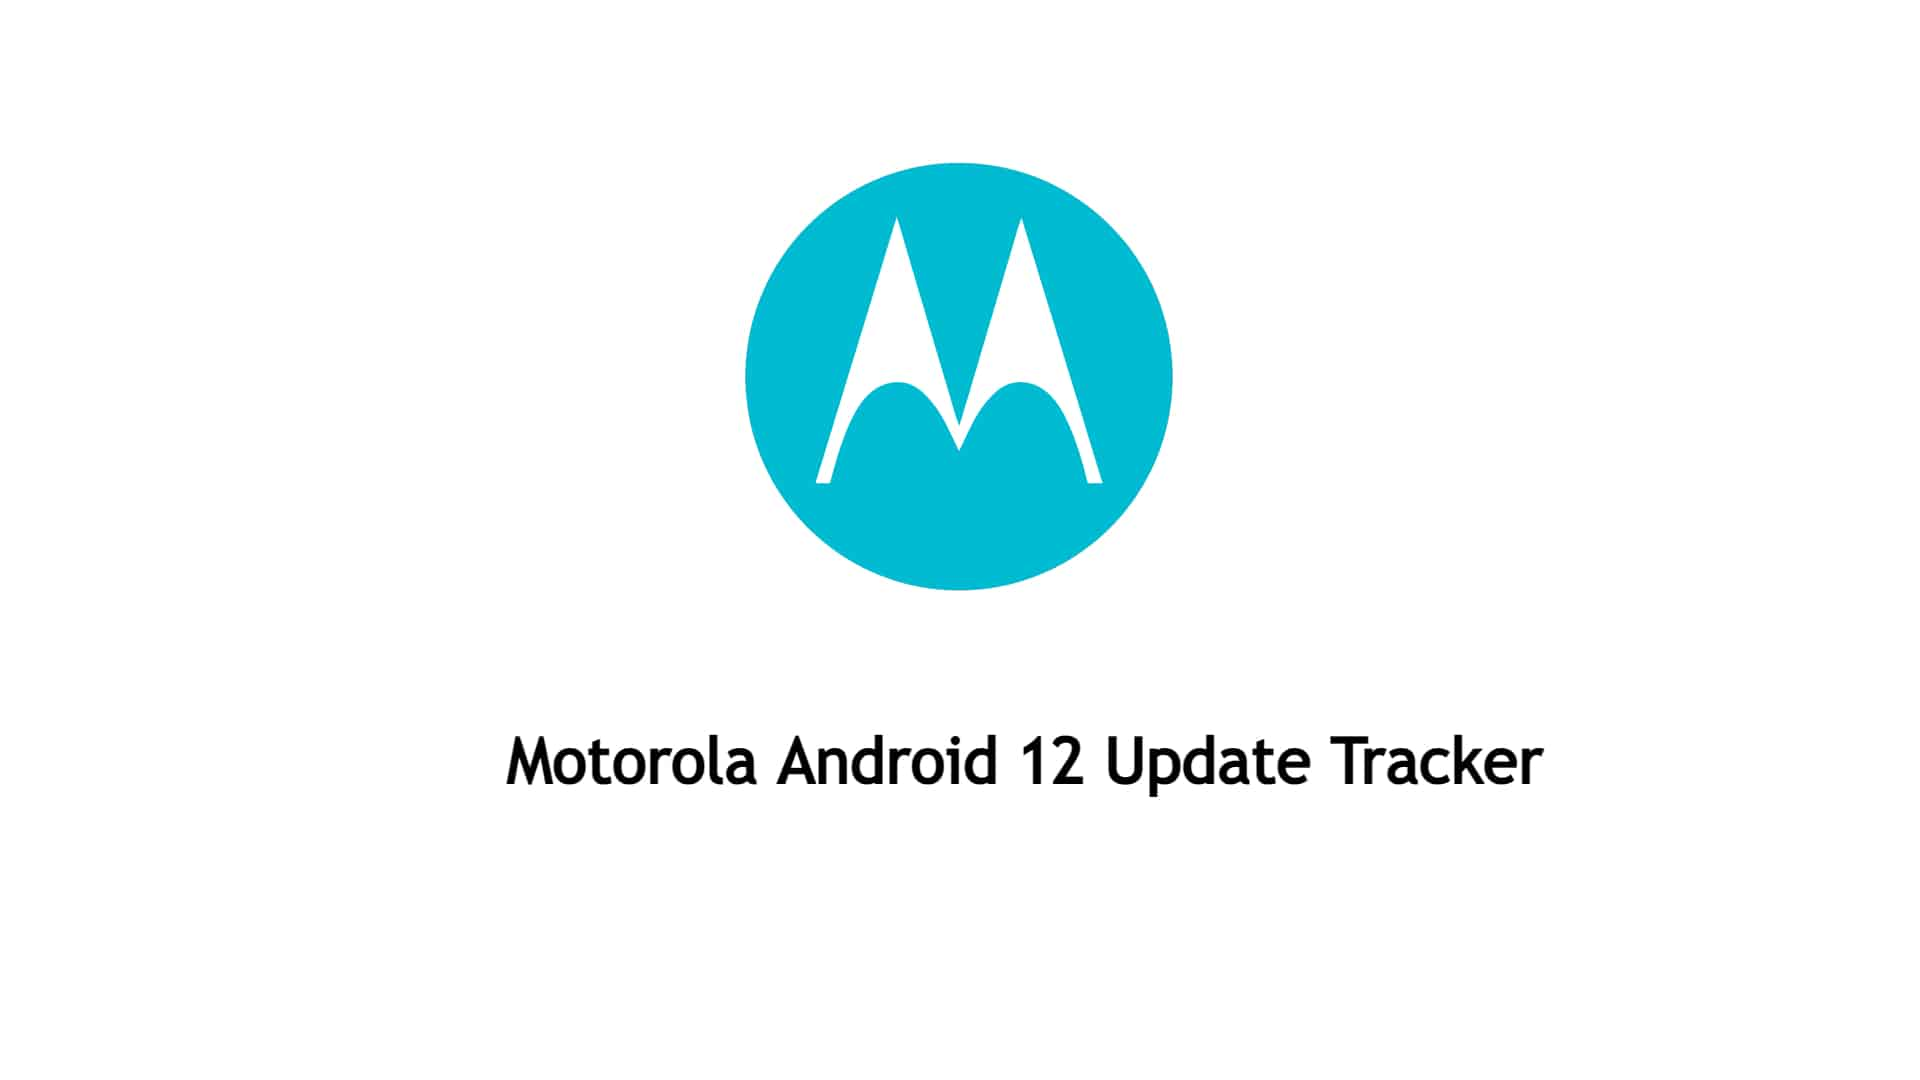 Motorola Android 12 update